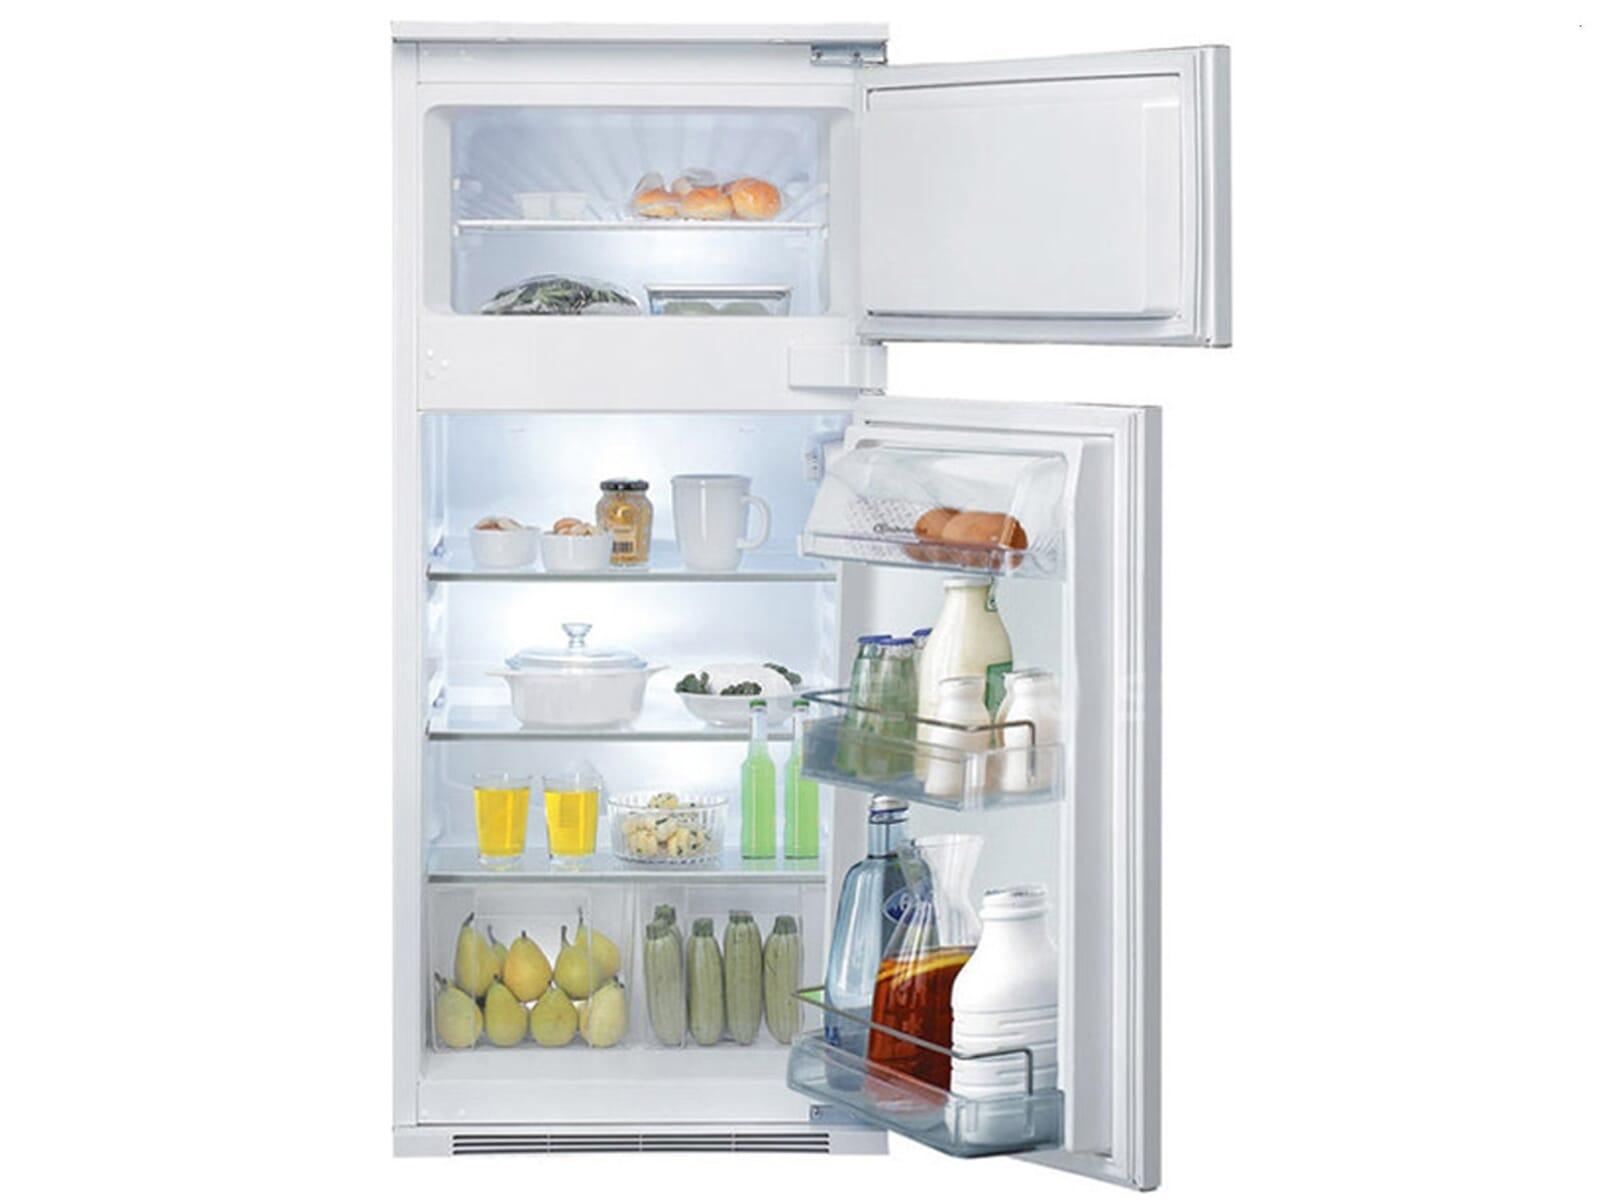 Miniküche Mit Kühlschrank Bauknecht : Küche kühlschrank einbauen kühlschrankumbauschrank venedig incl